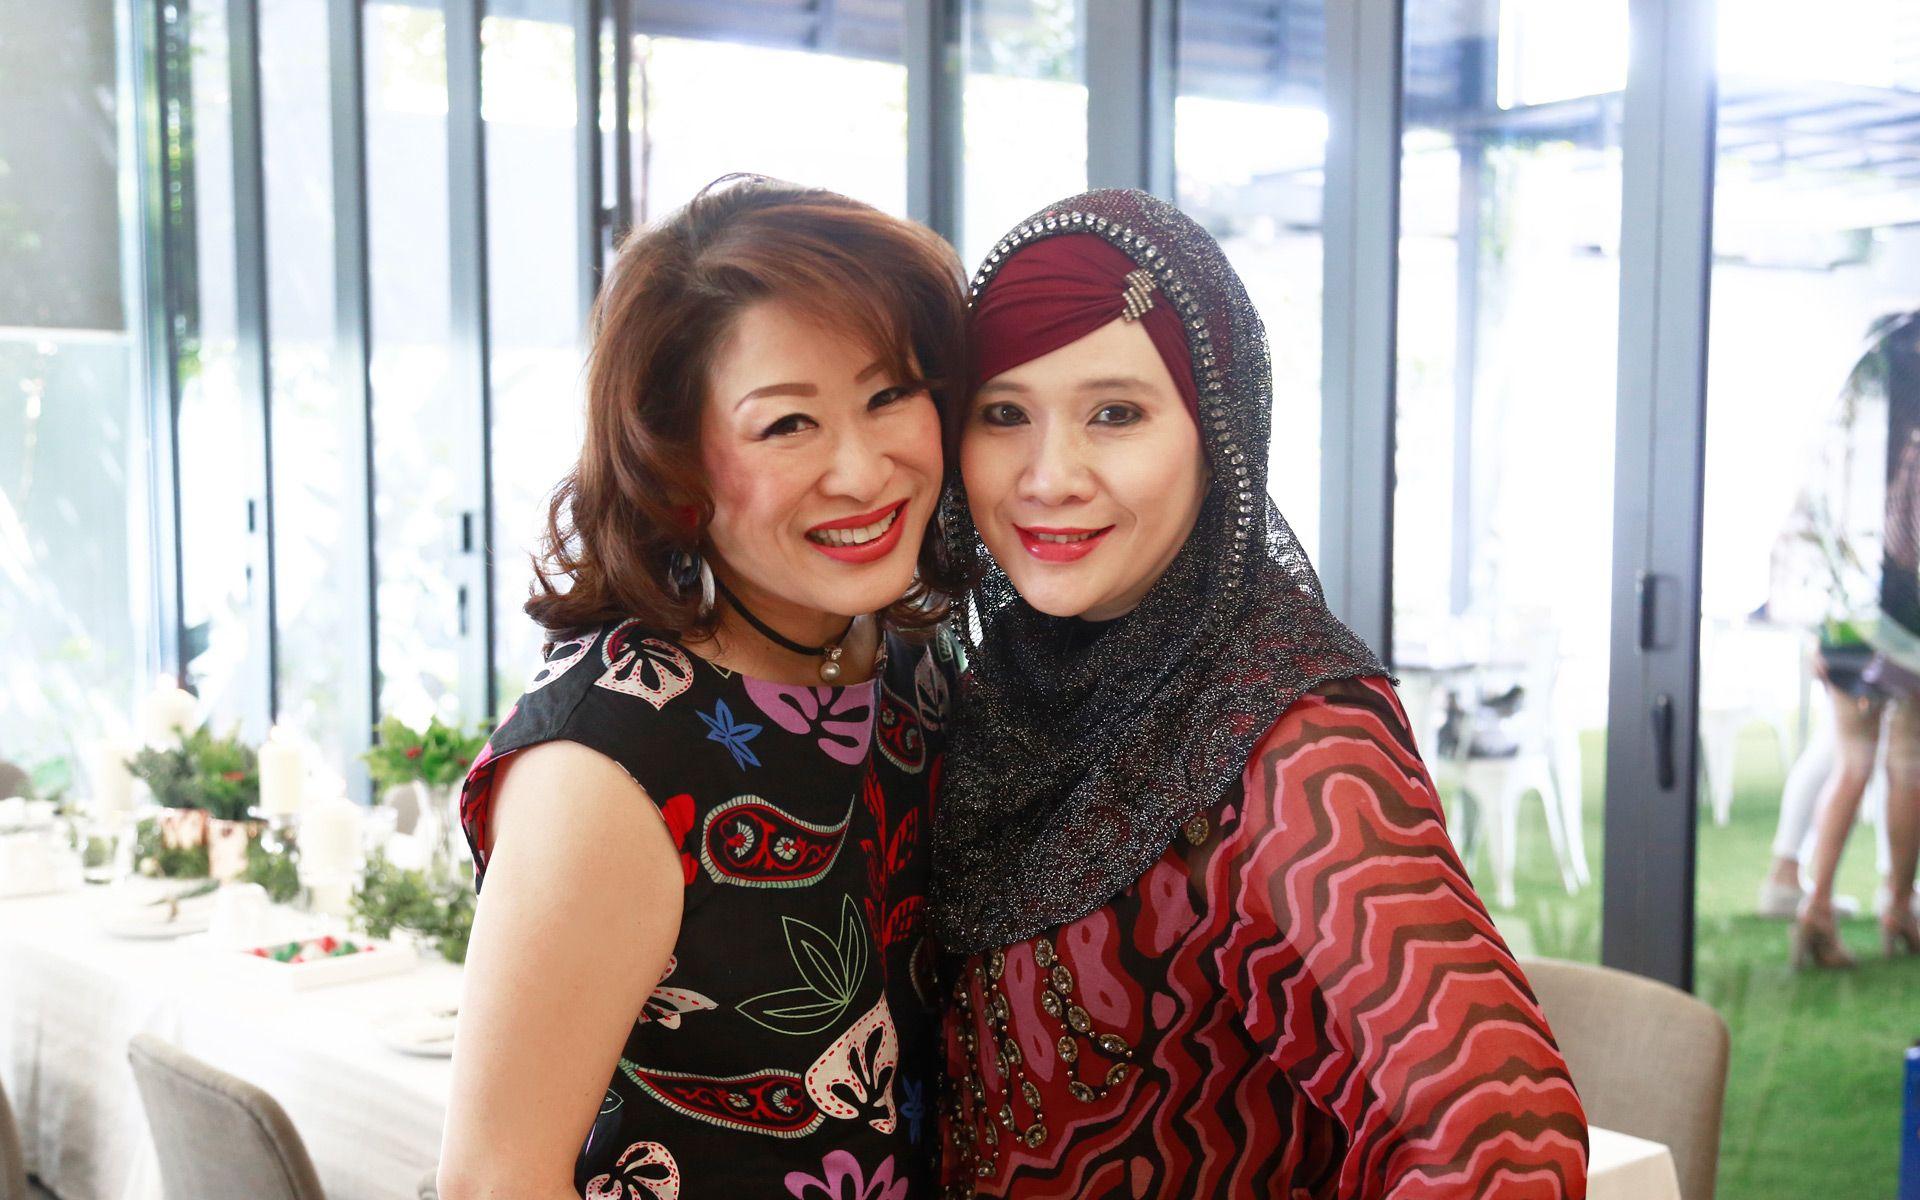 Adeline Saw and Puspayanti Mohd Asraf